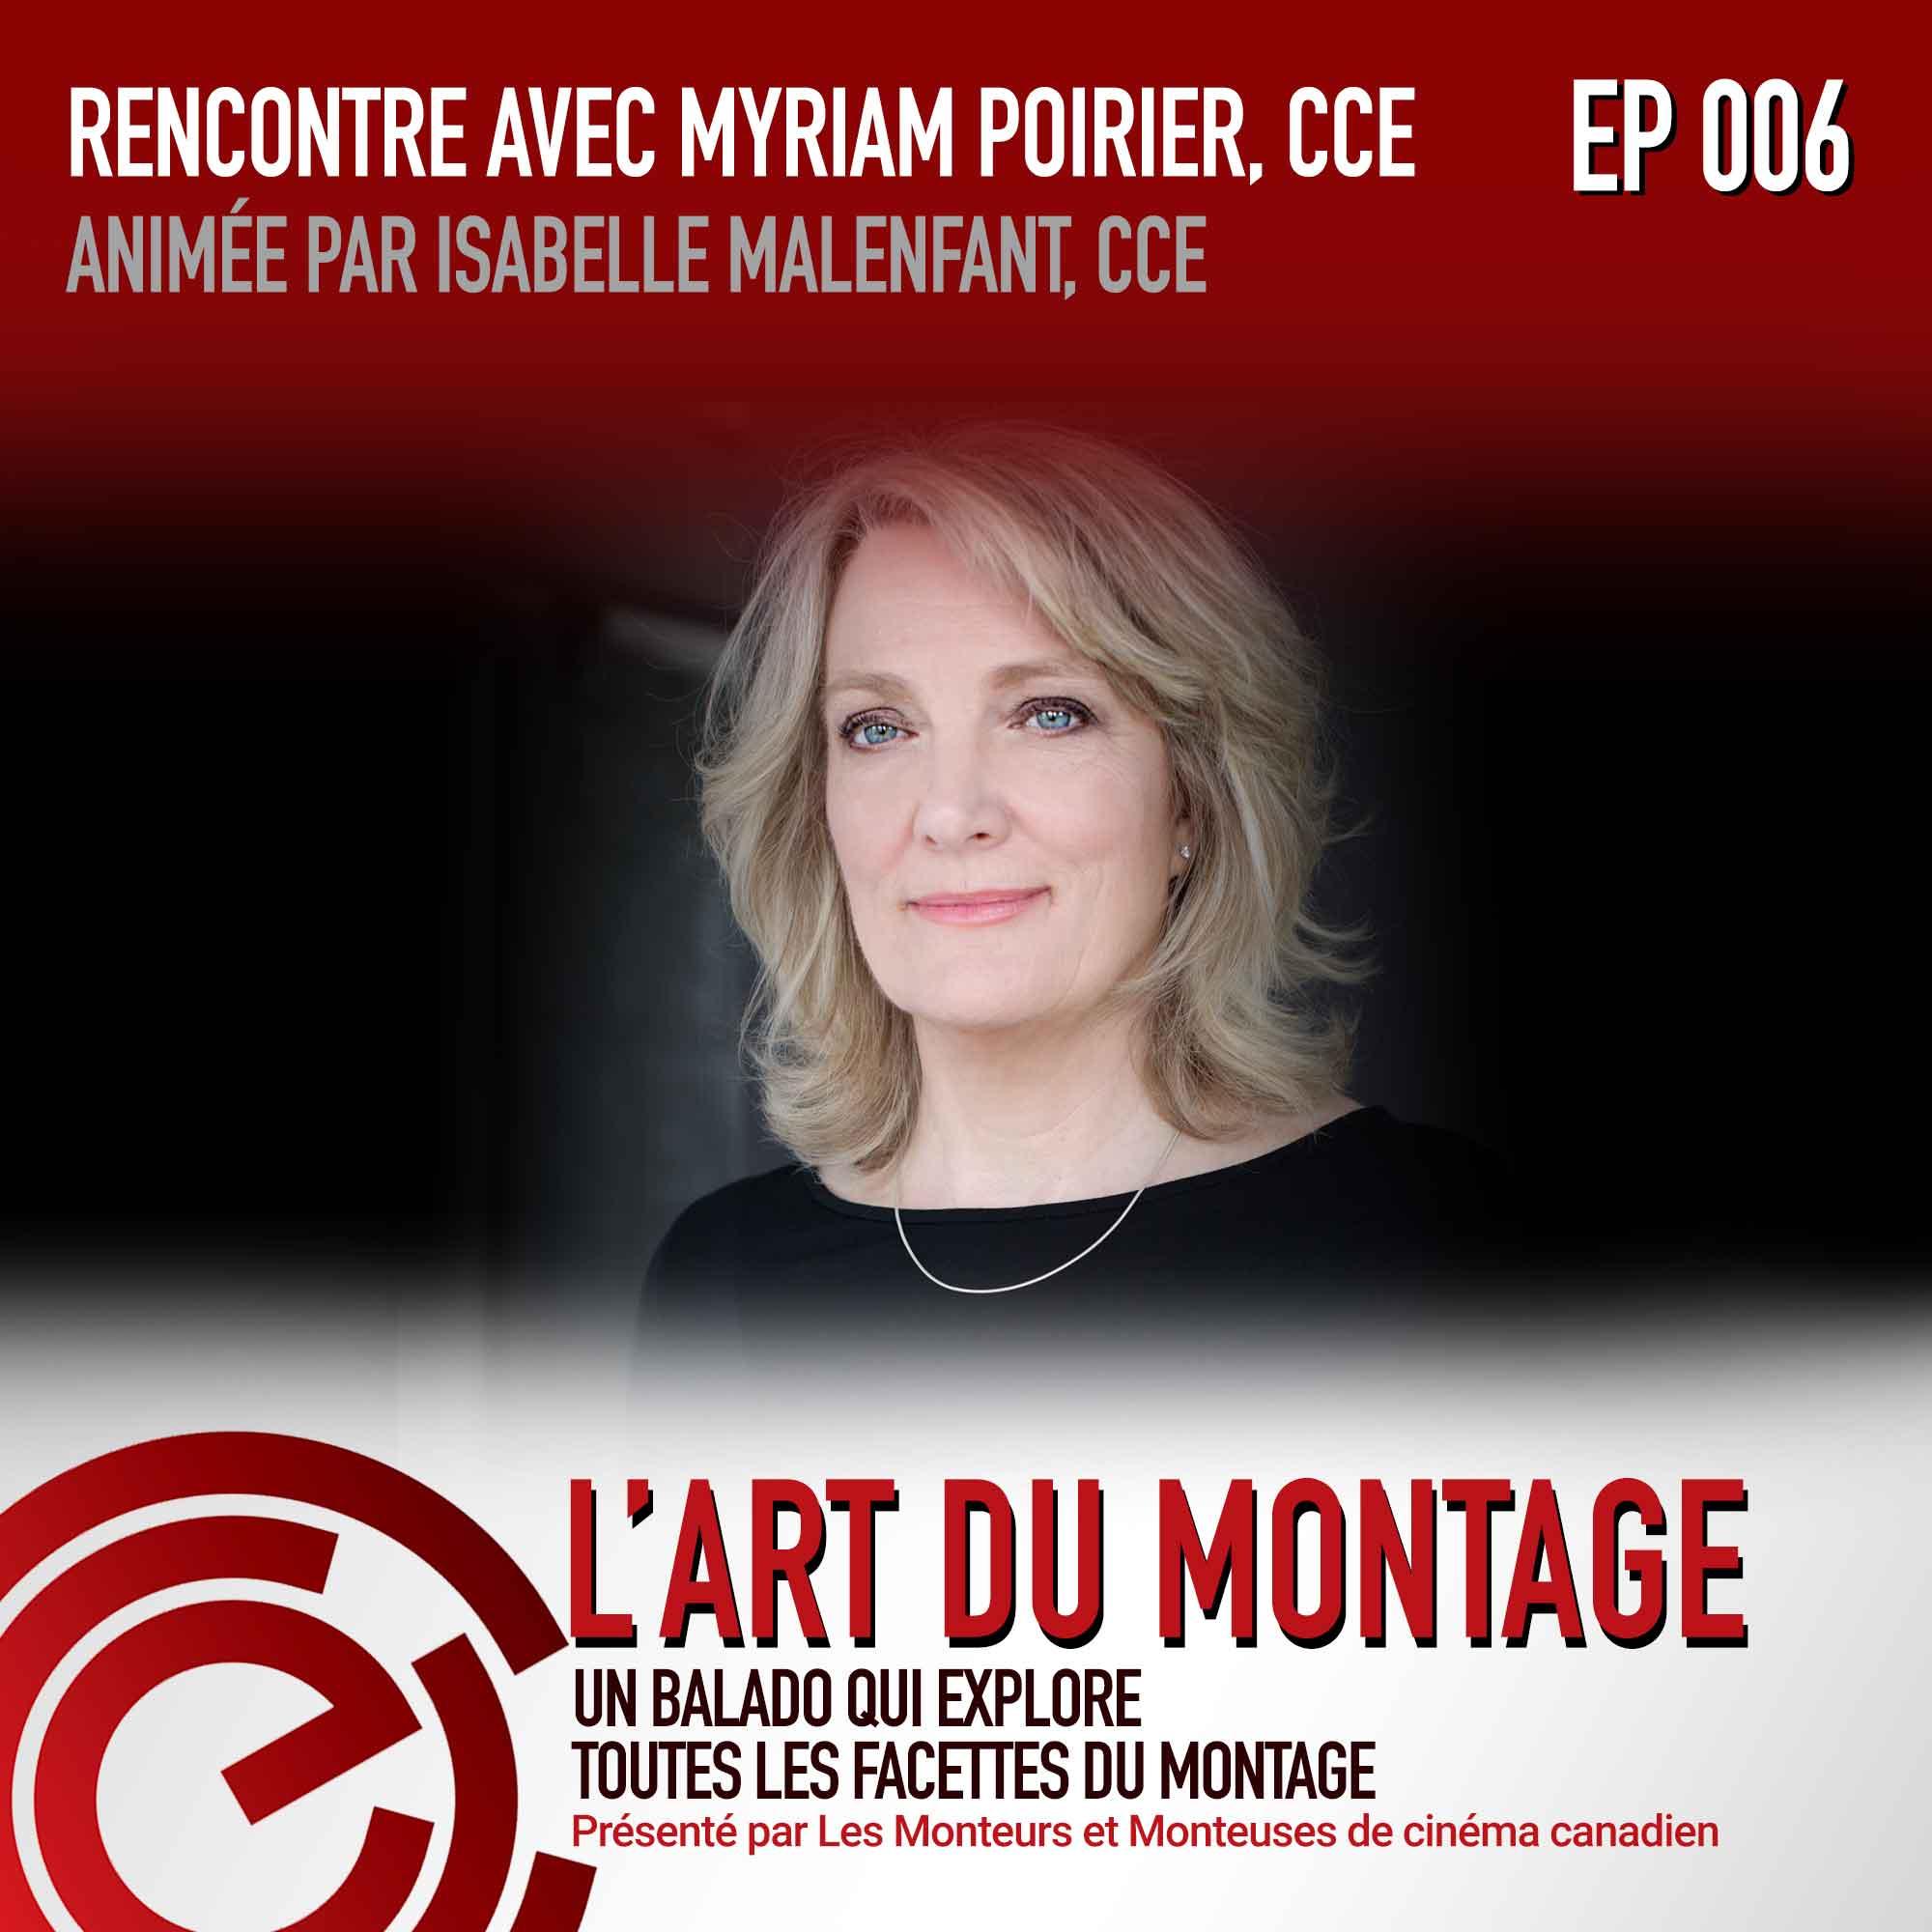 EPISODE006_Interview with Myriam Poirier, CCE